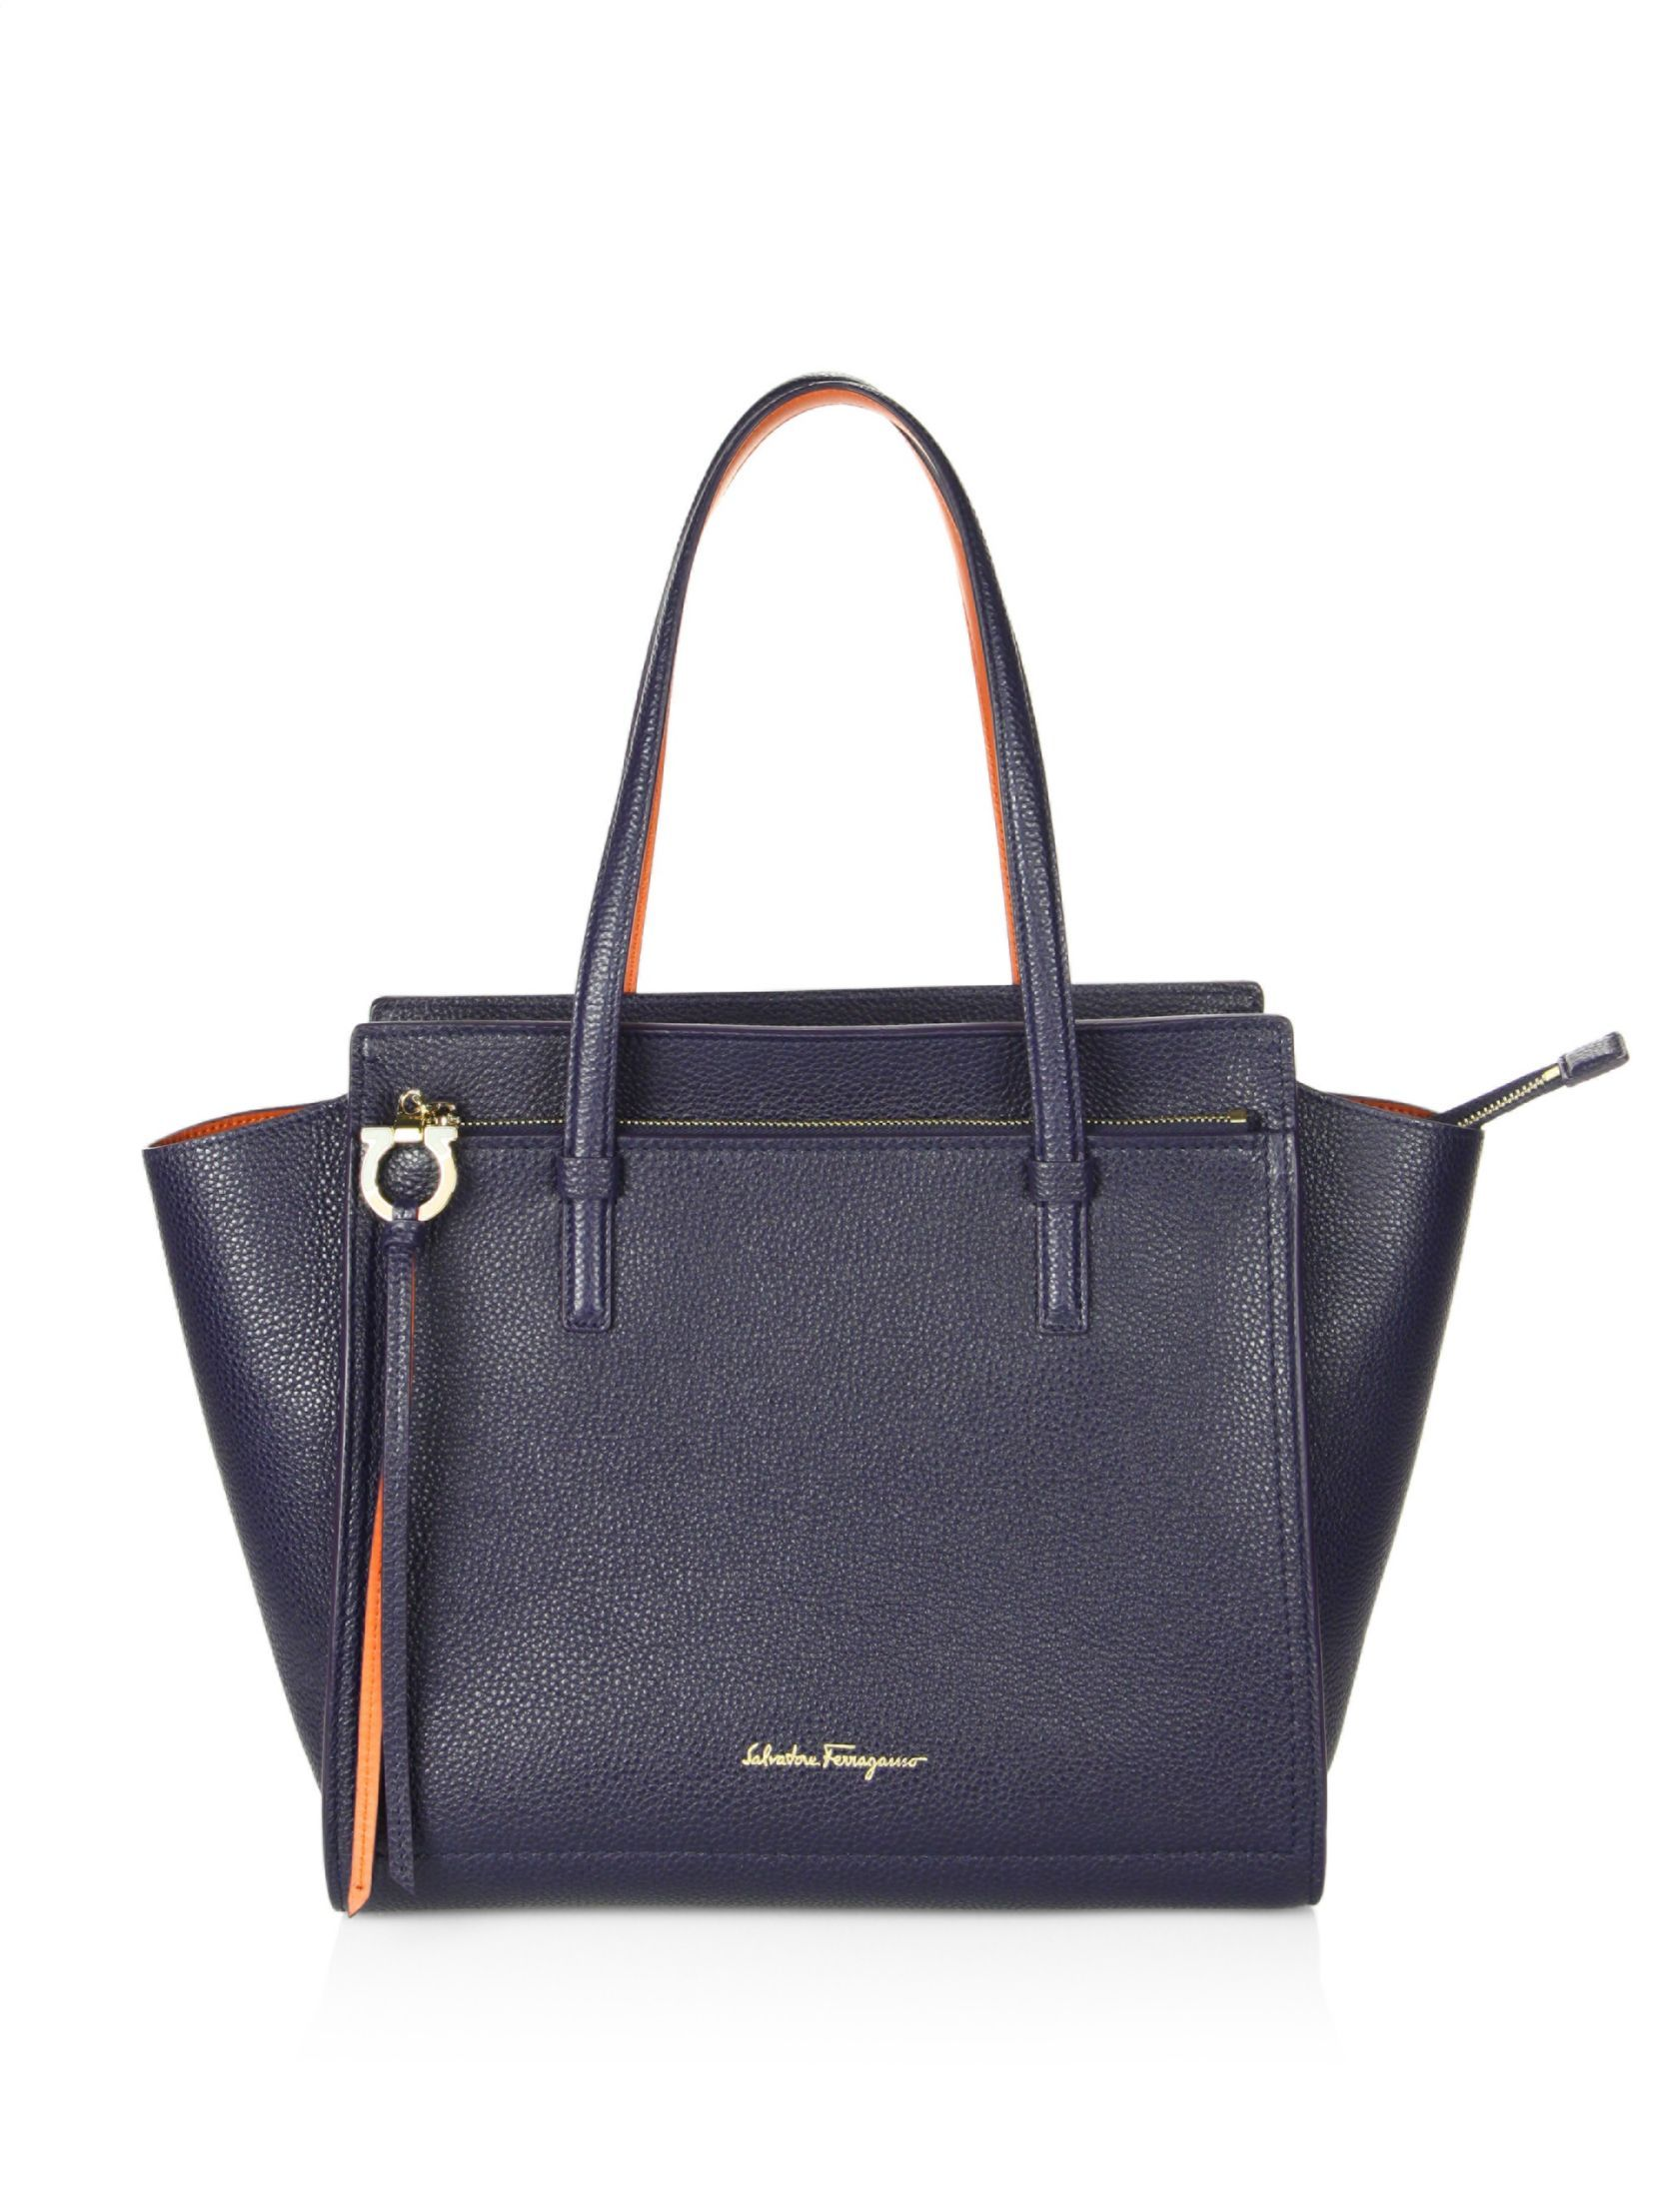 Black hammered leather bag Salvatore Ferragamo c4VBH8